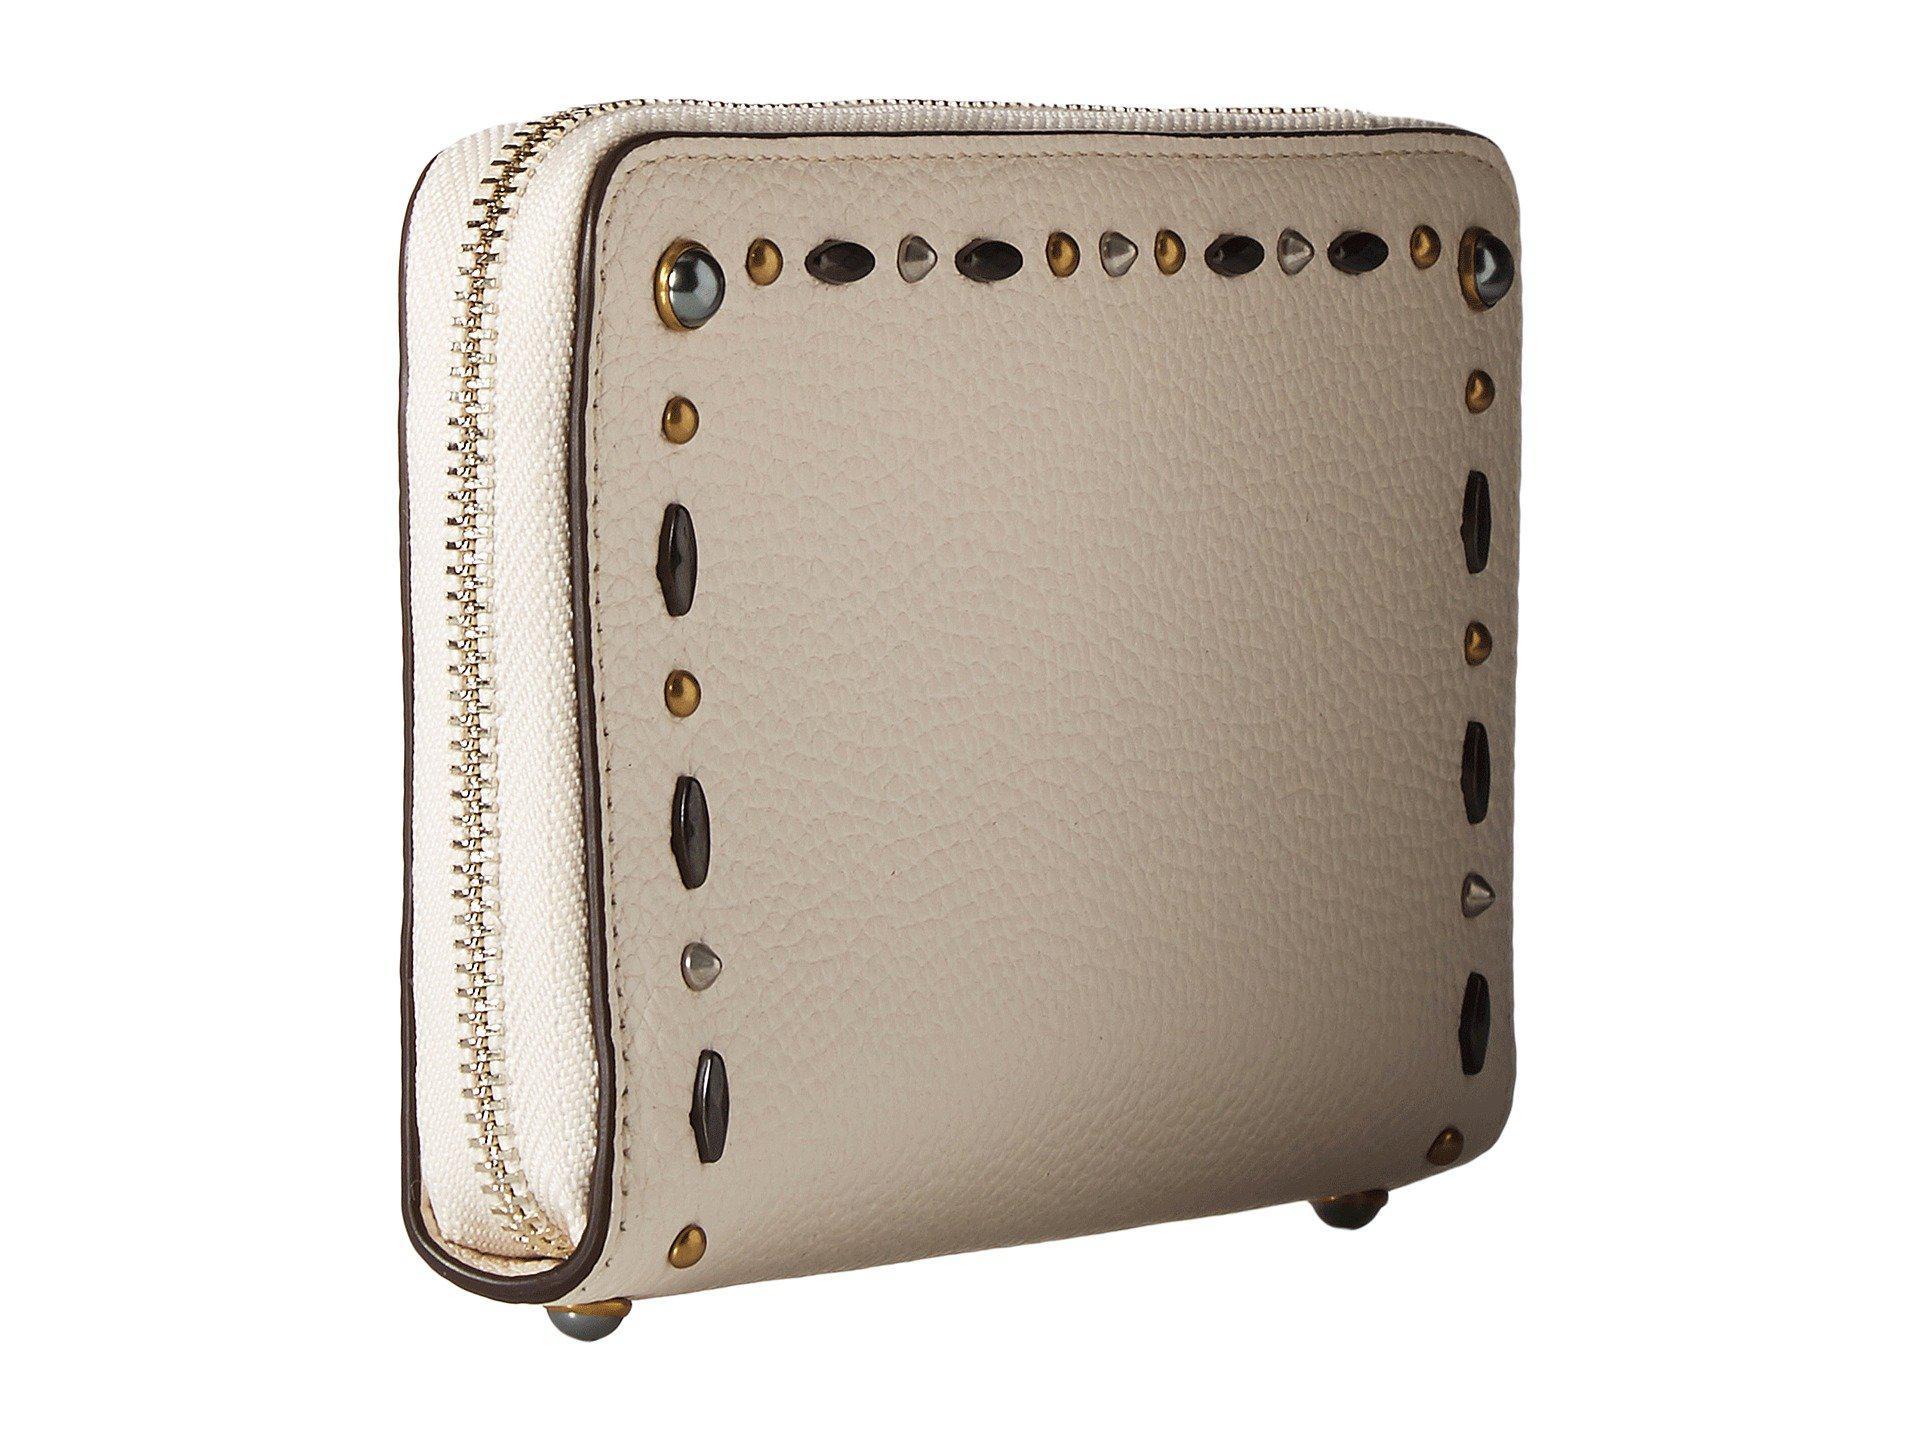 4871b543e8b Lyst - COACH Medium Zip Around Wallet With Prairie Rivets